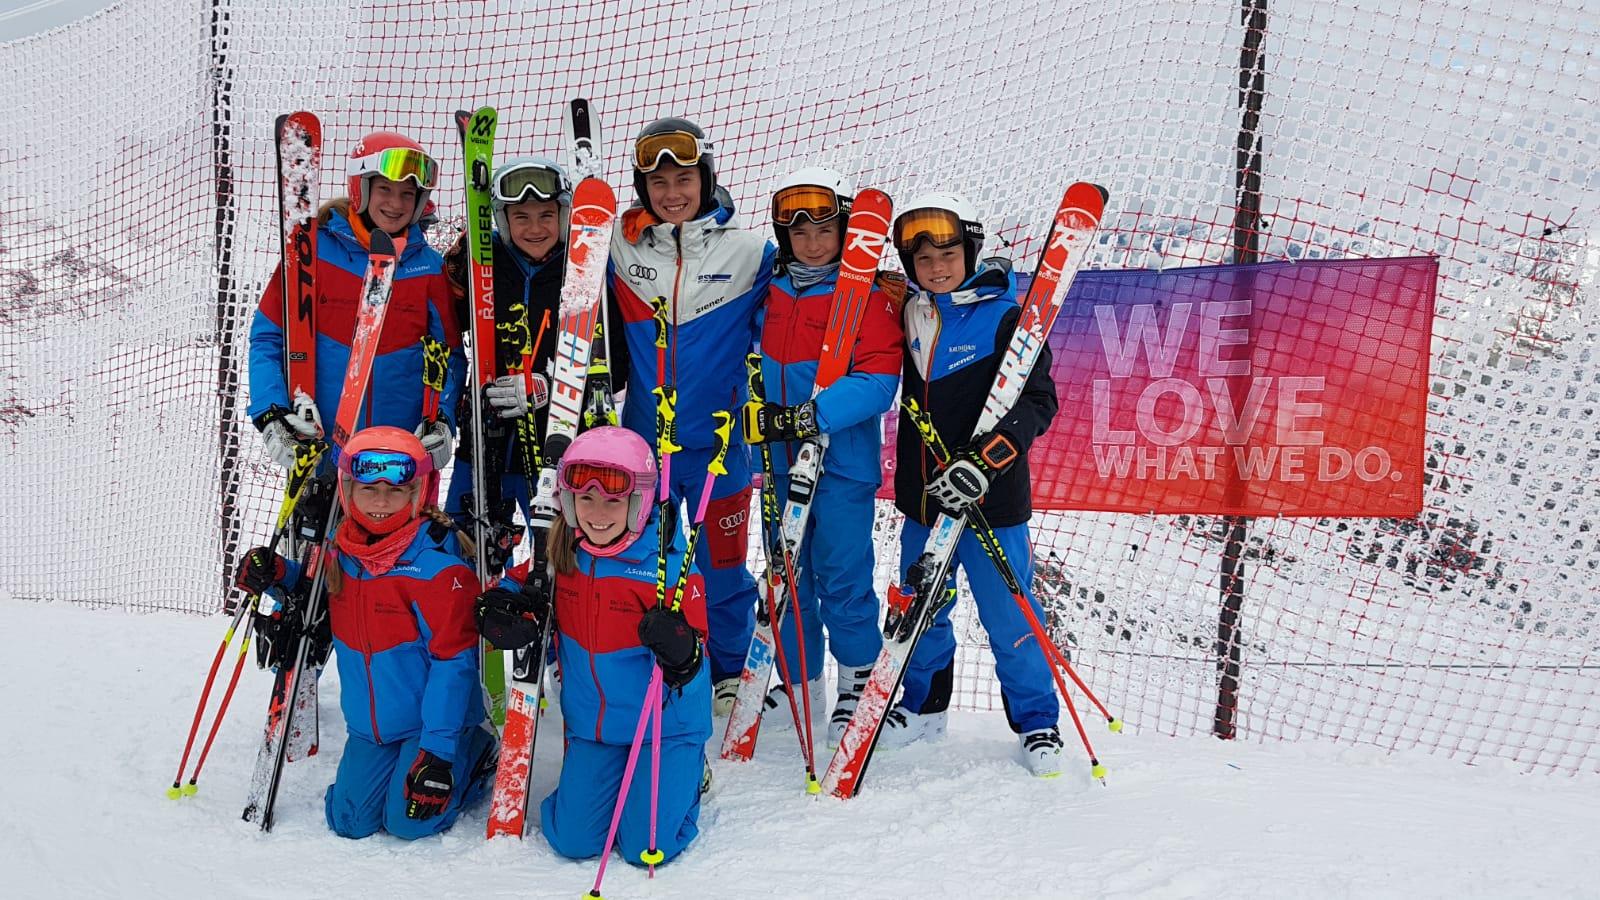 19_10 Trainingsteam des Skiclub Koenigsbrunn